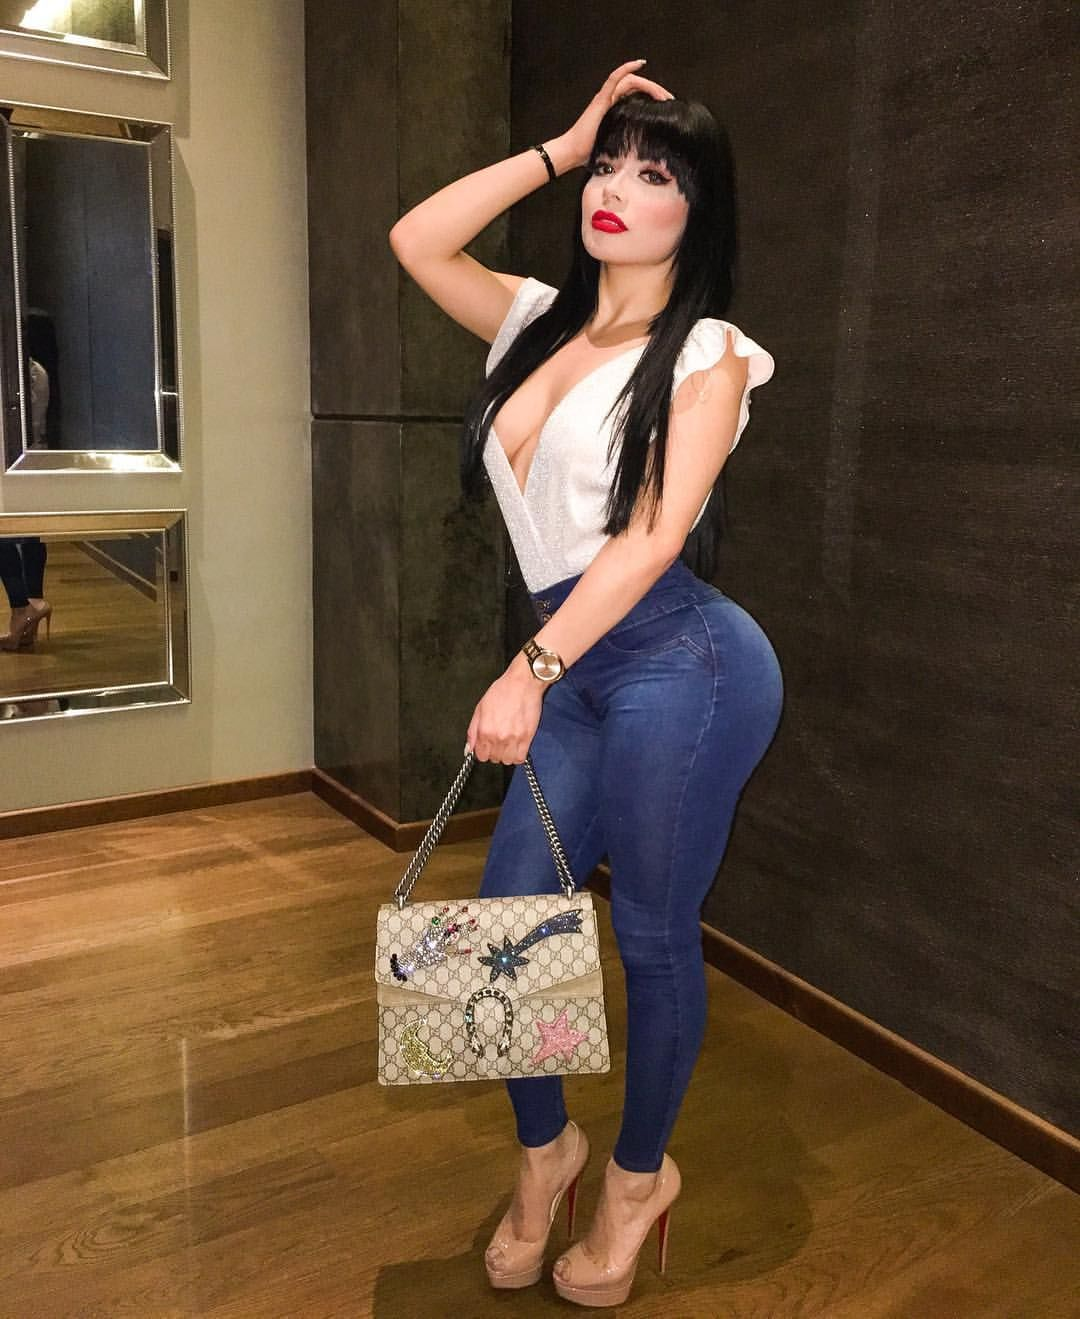 Celebrity Tracy Saenz naked (12 photos), Pussy, Paparazzi, Feet, butt 2019